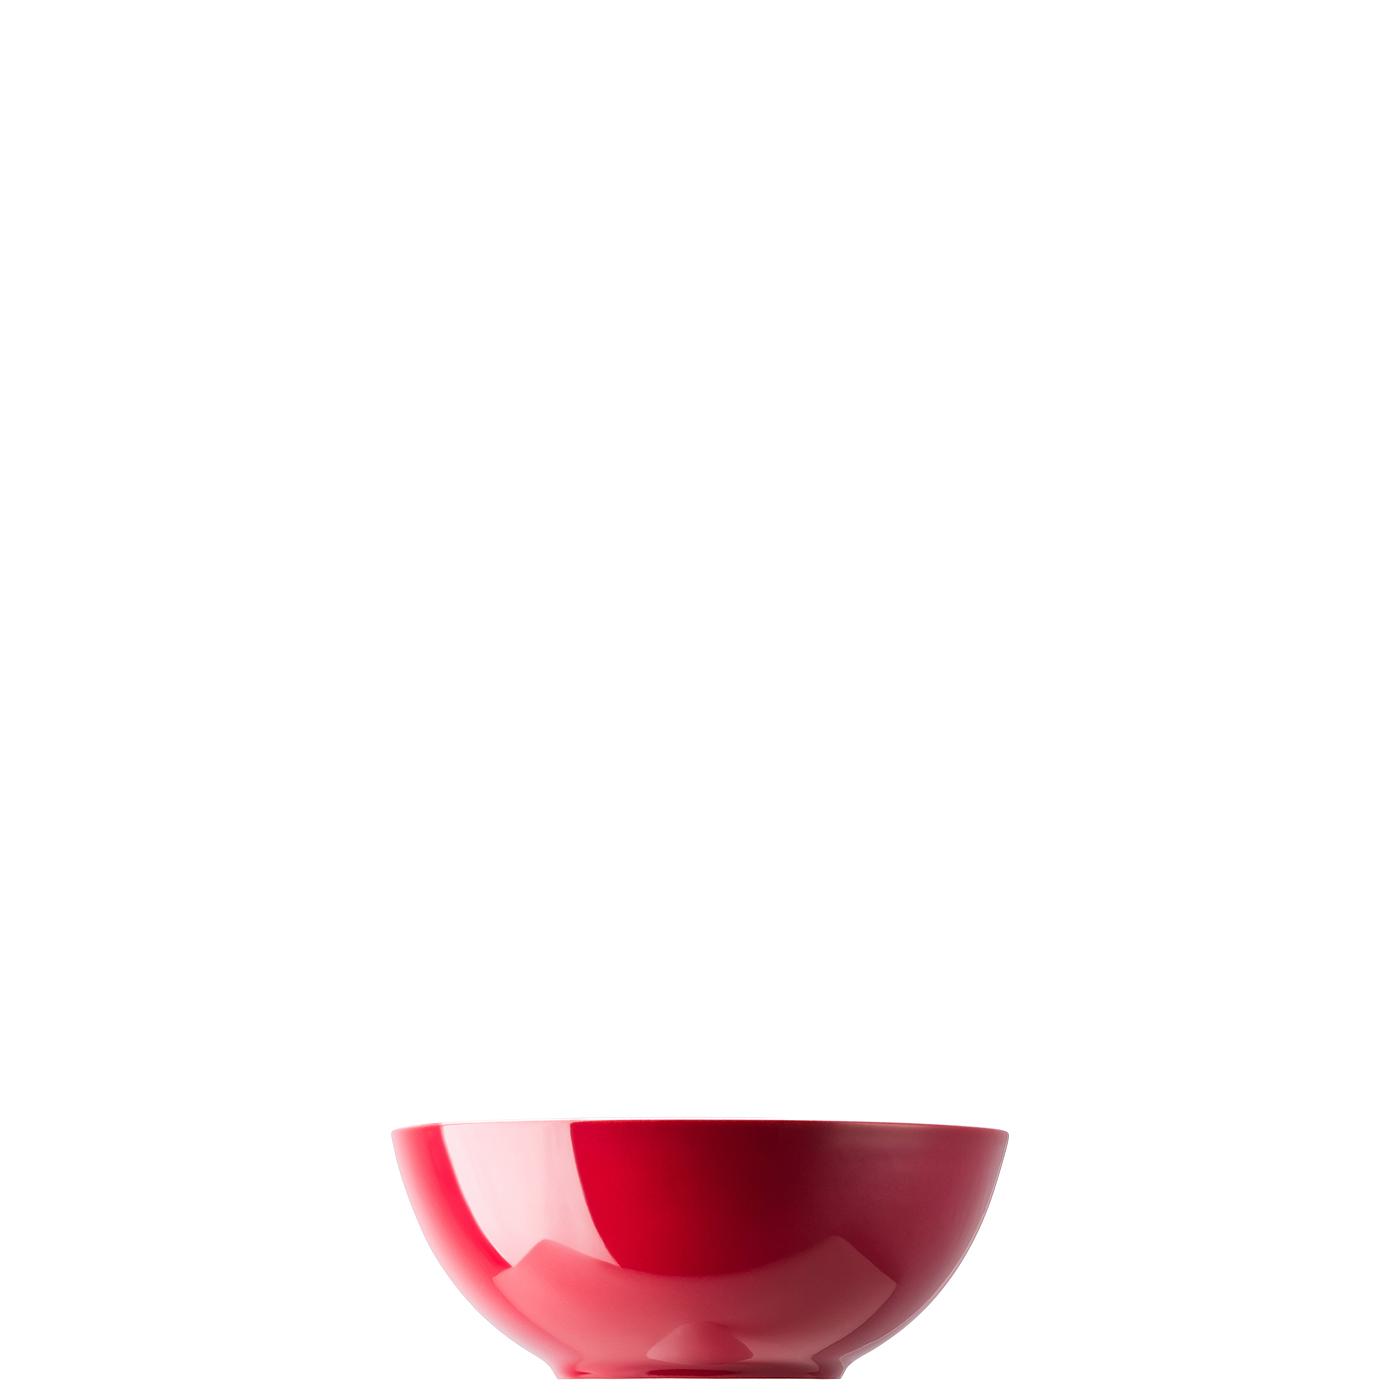 Müslischale 15 cm Sunny Day Fuchsia Thomas Porzellan